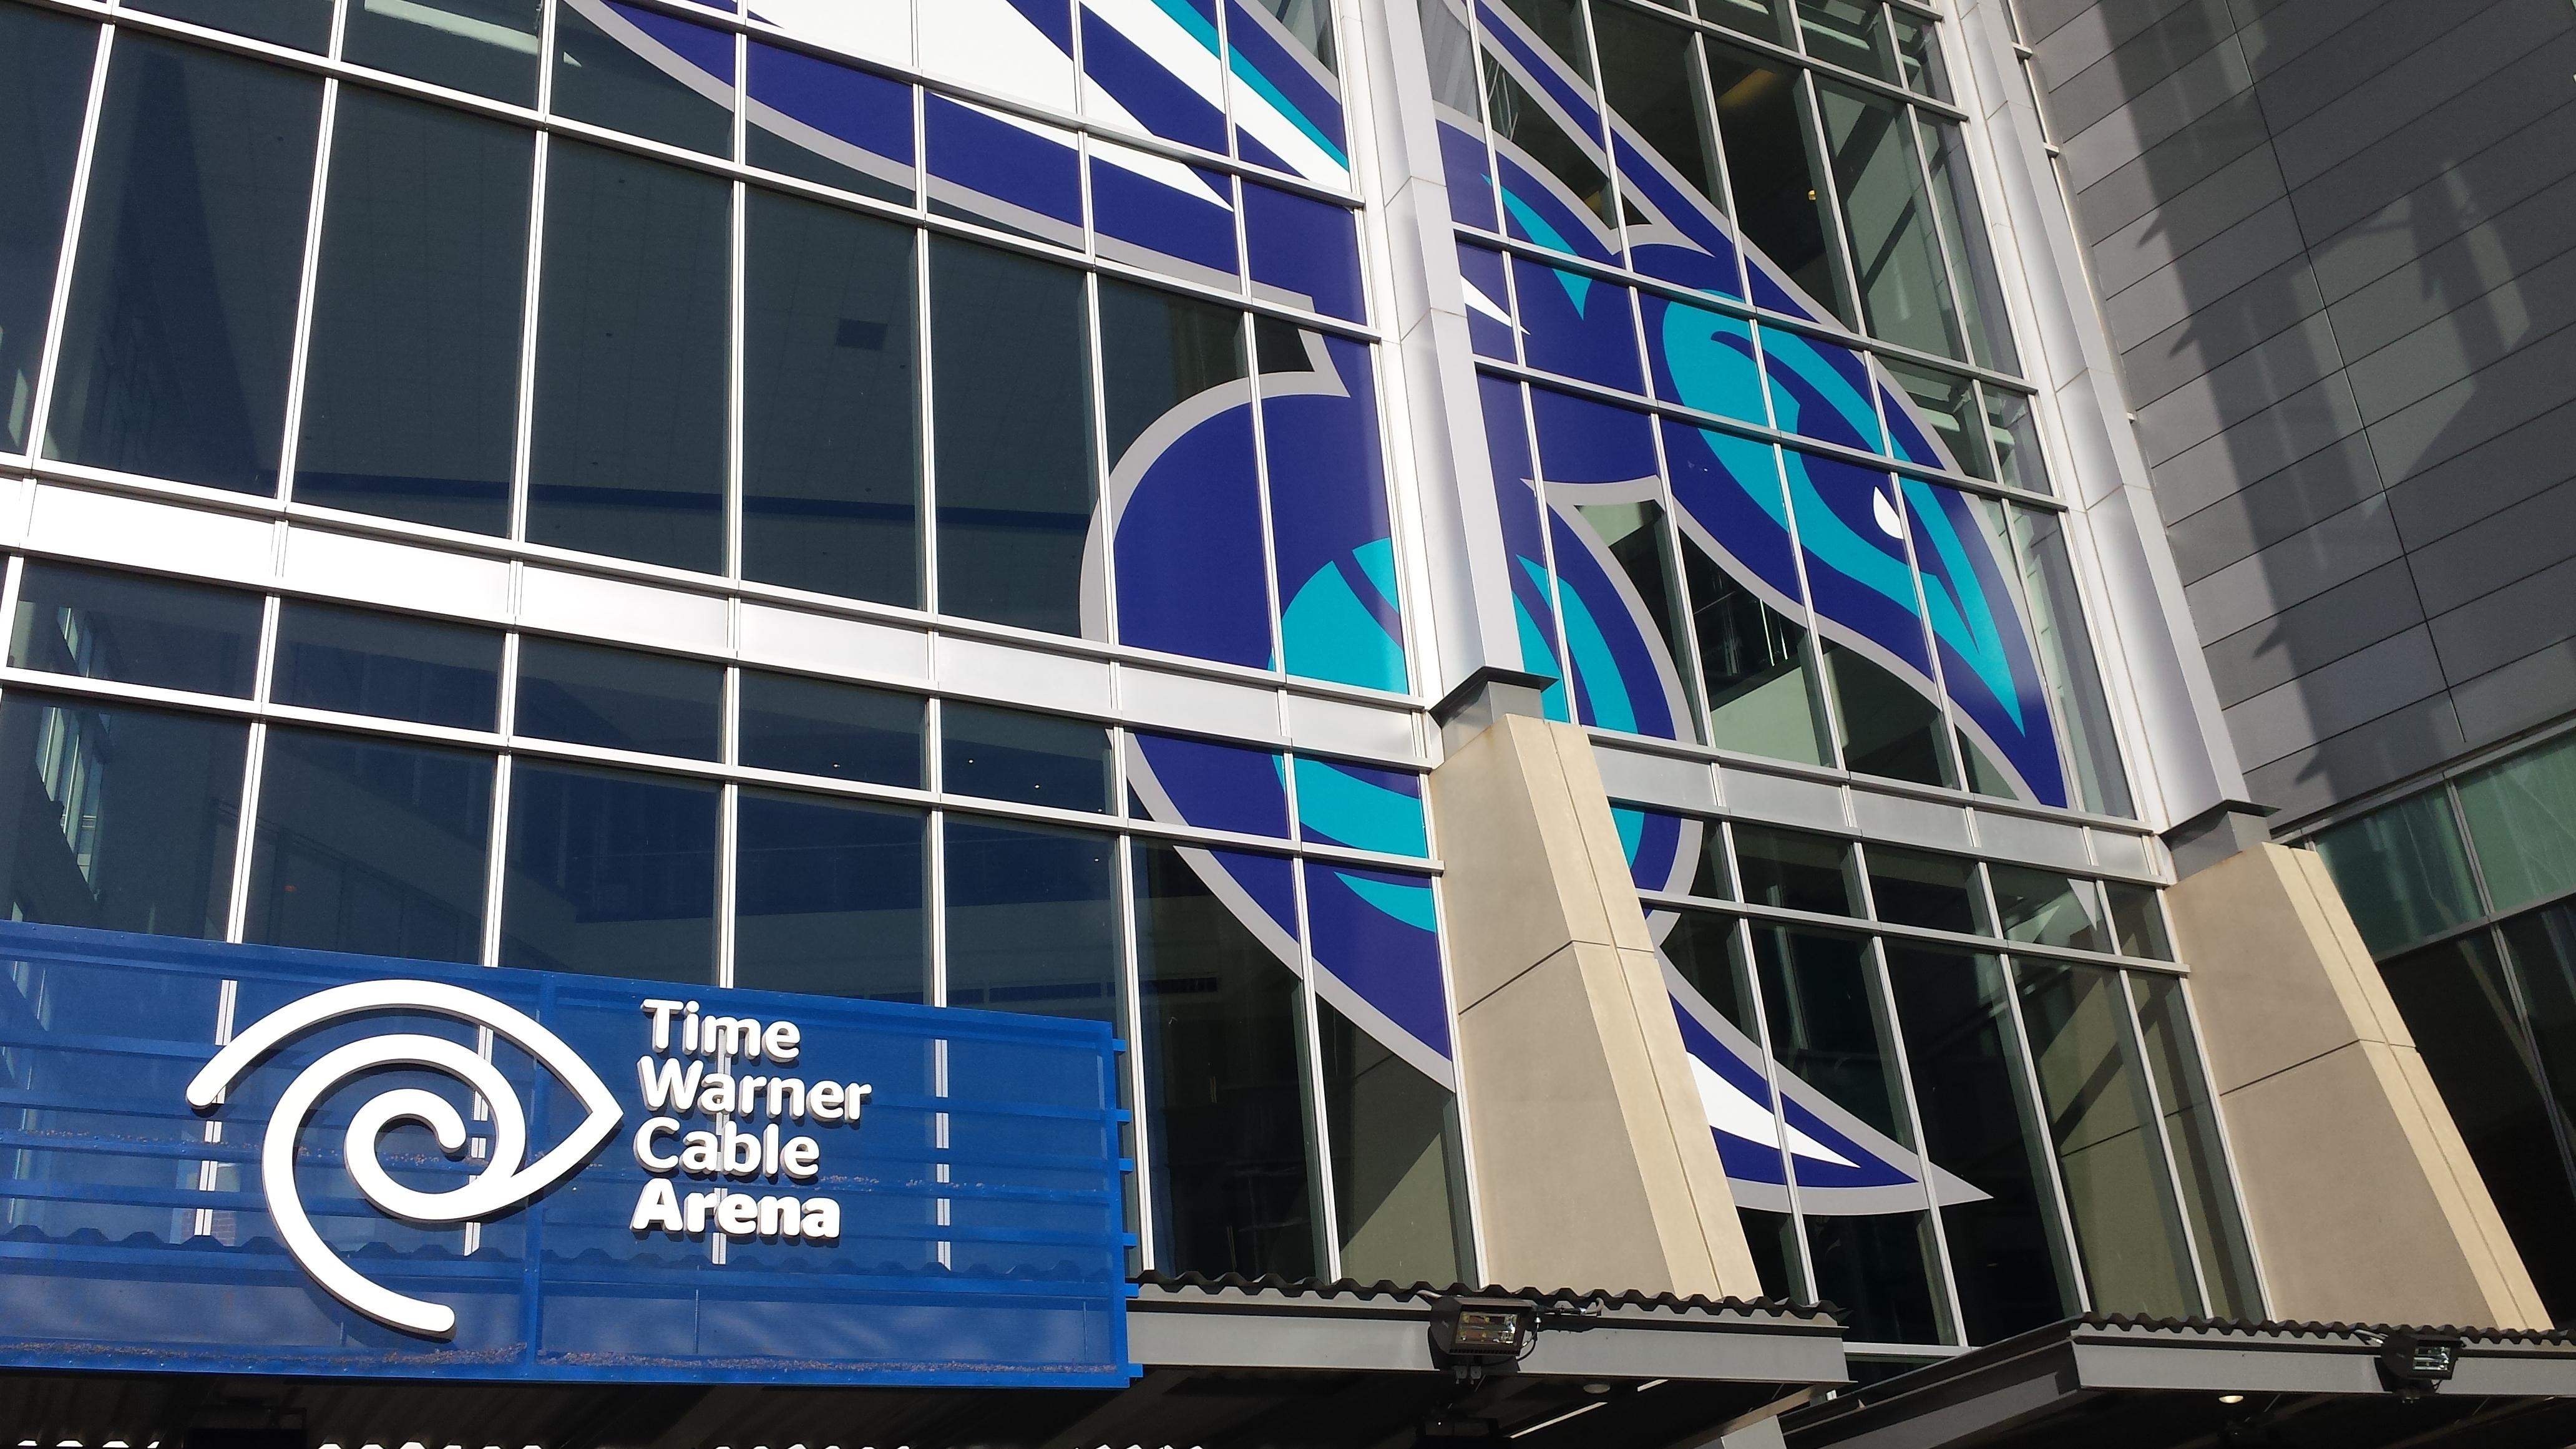 Pic-TWC Arena (1)